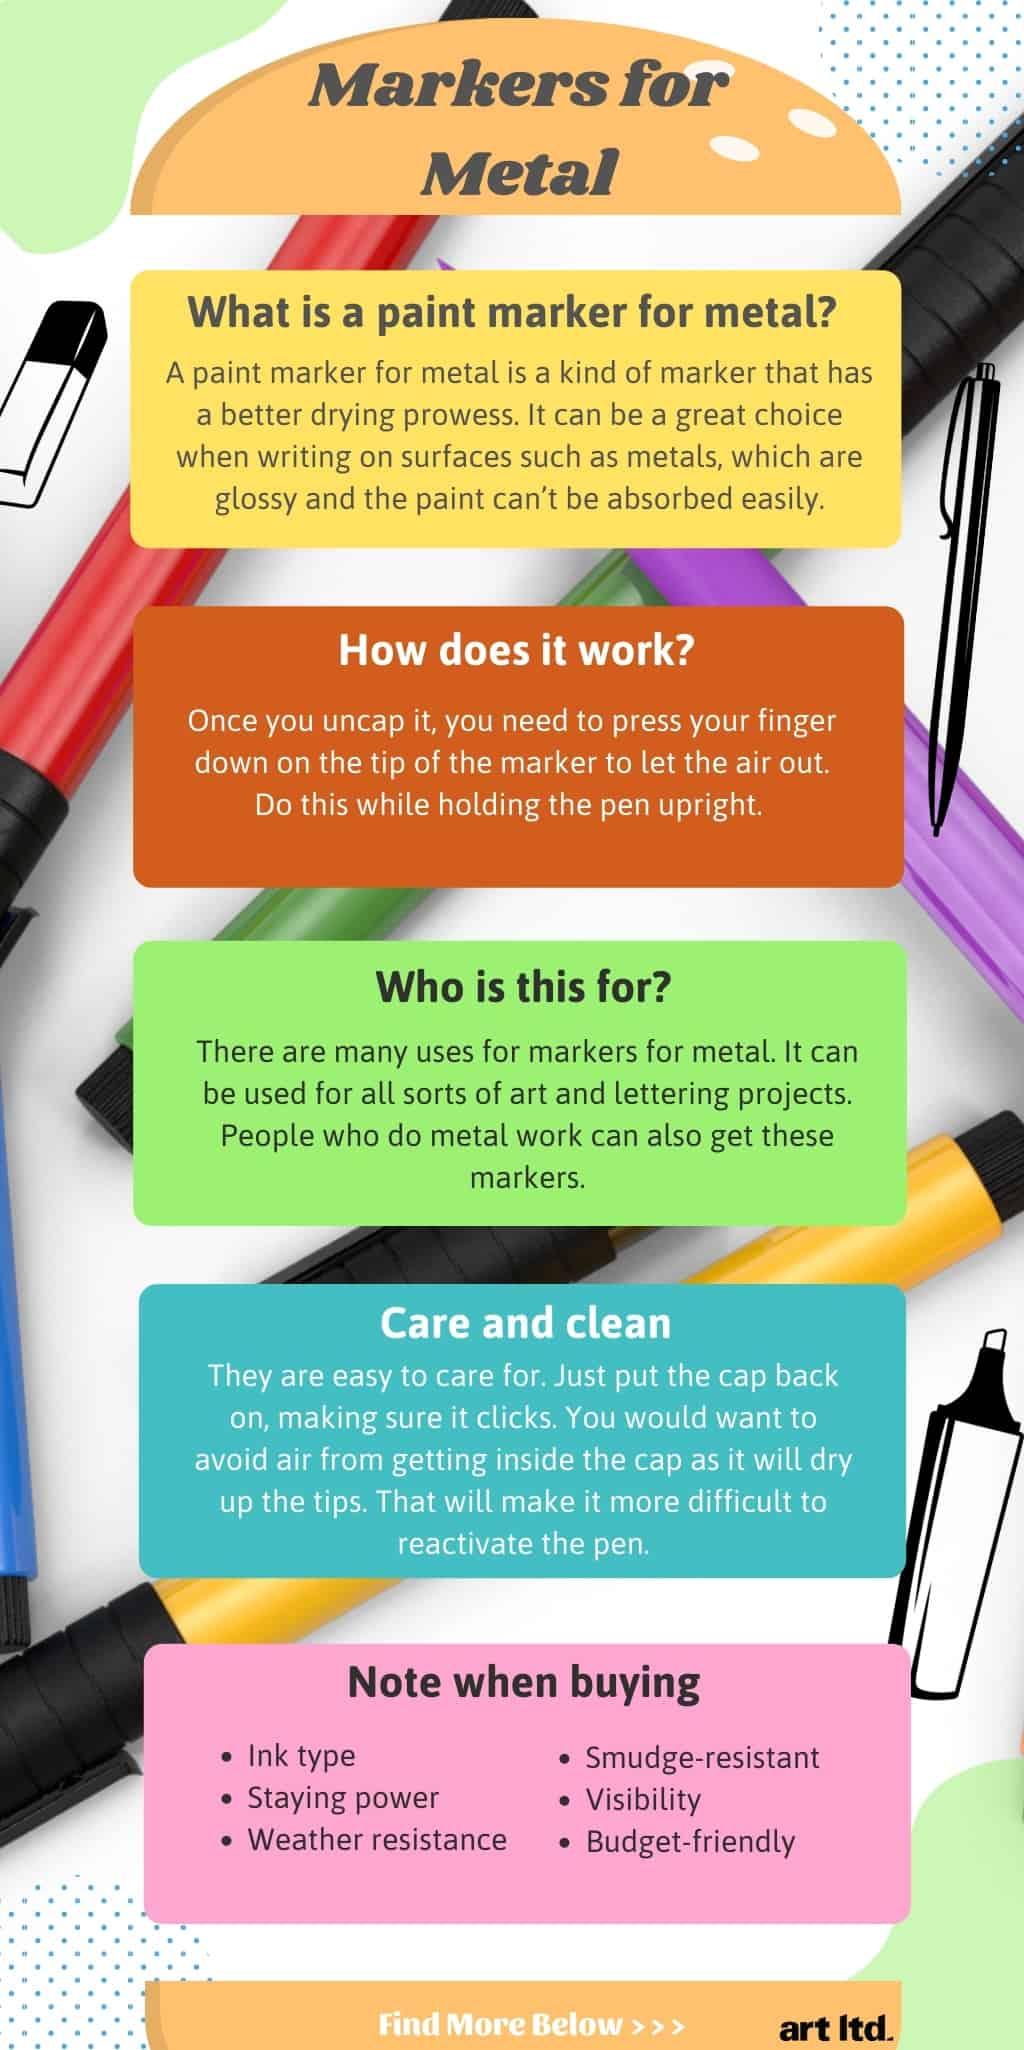 paint-marker-pen-for-metal